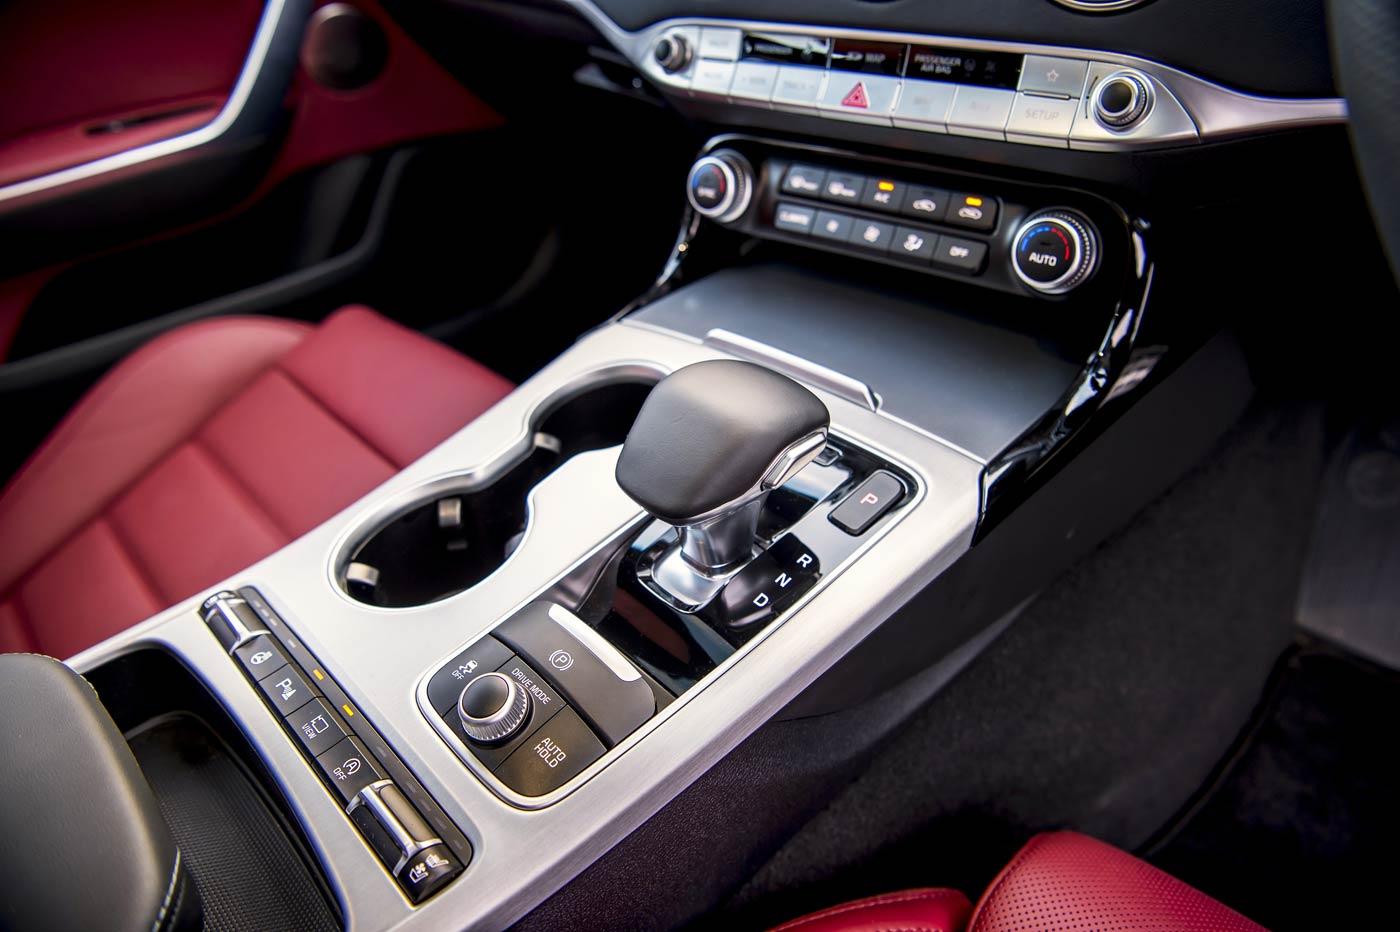 KIA Stinger 2.0 T-GDi GT-Line S gearbox drive modes